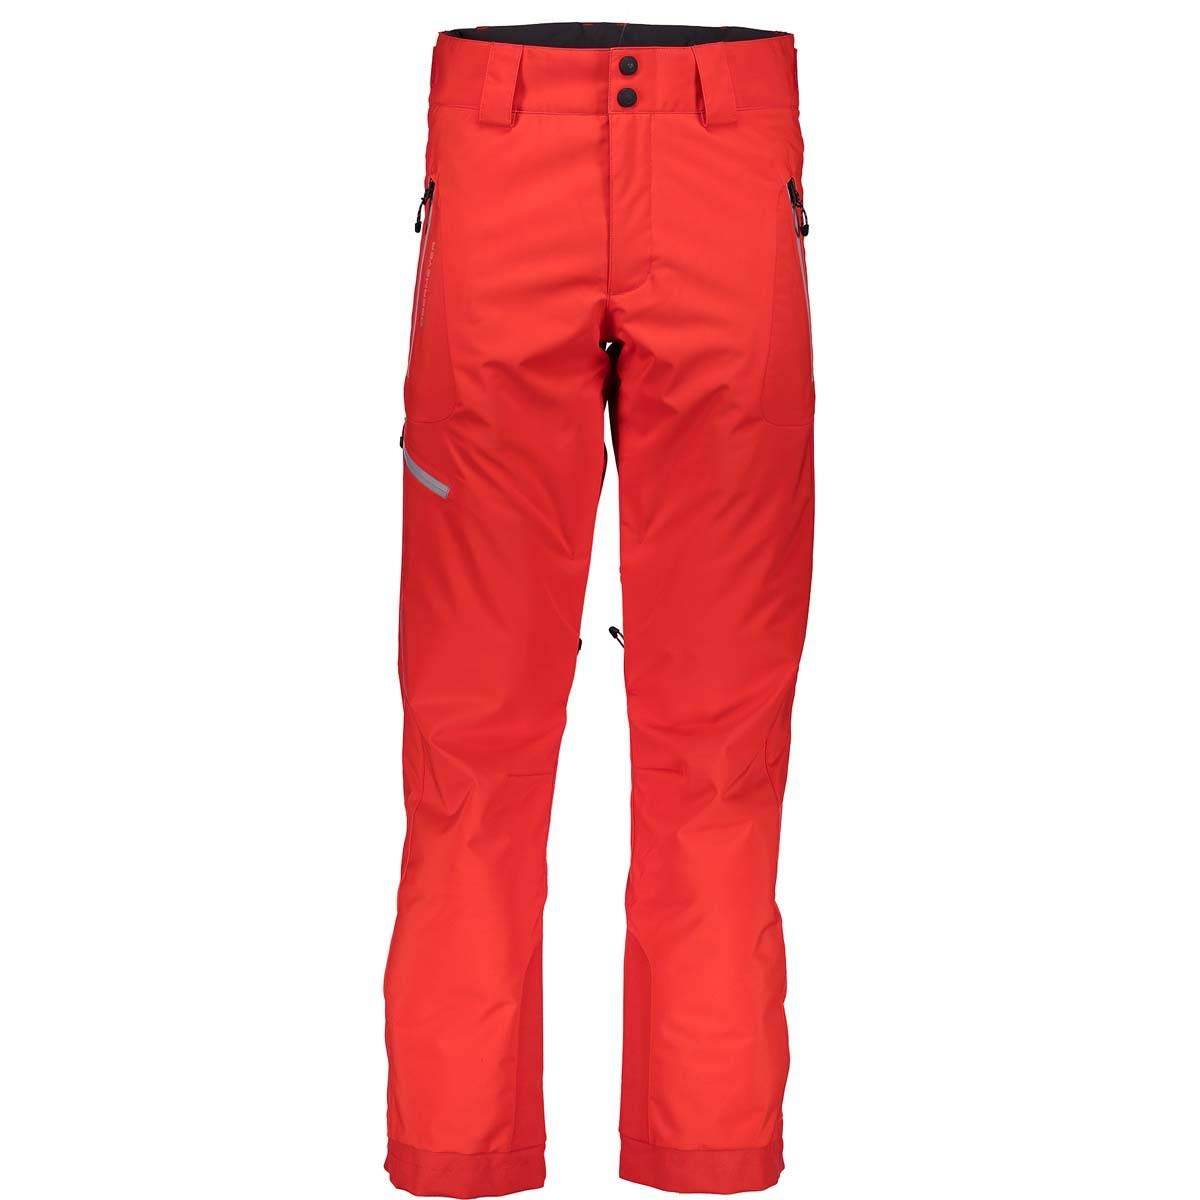 Obermeyer 25020 Men's Force Pant